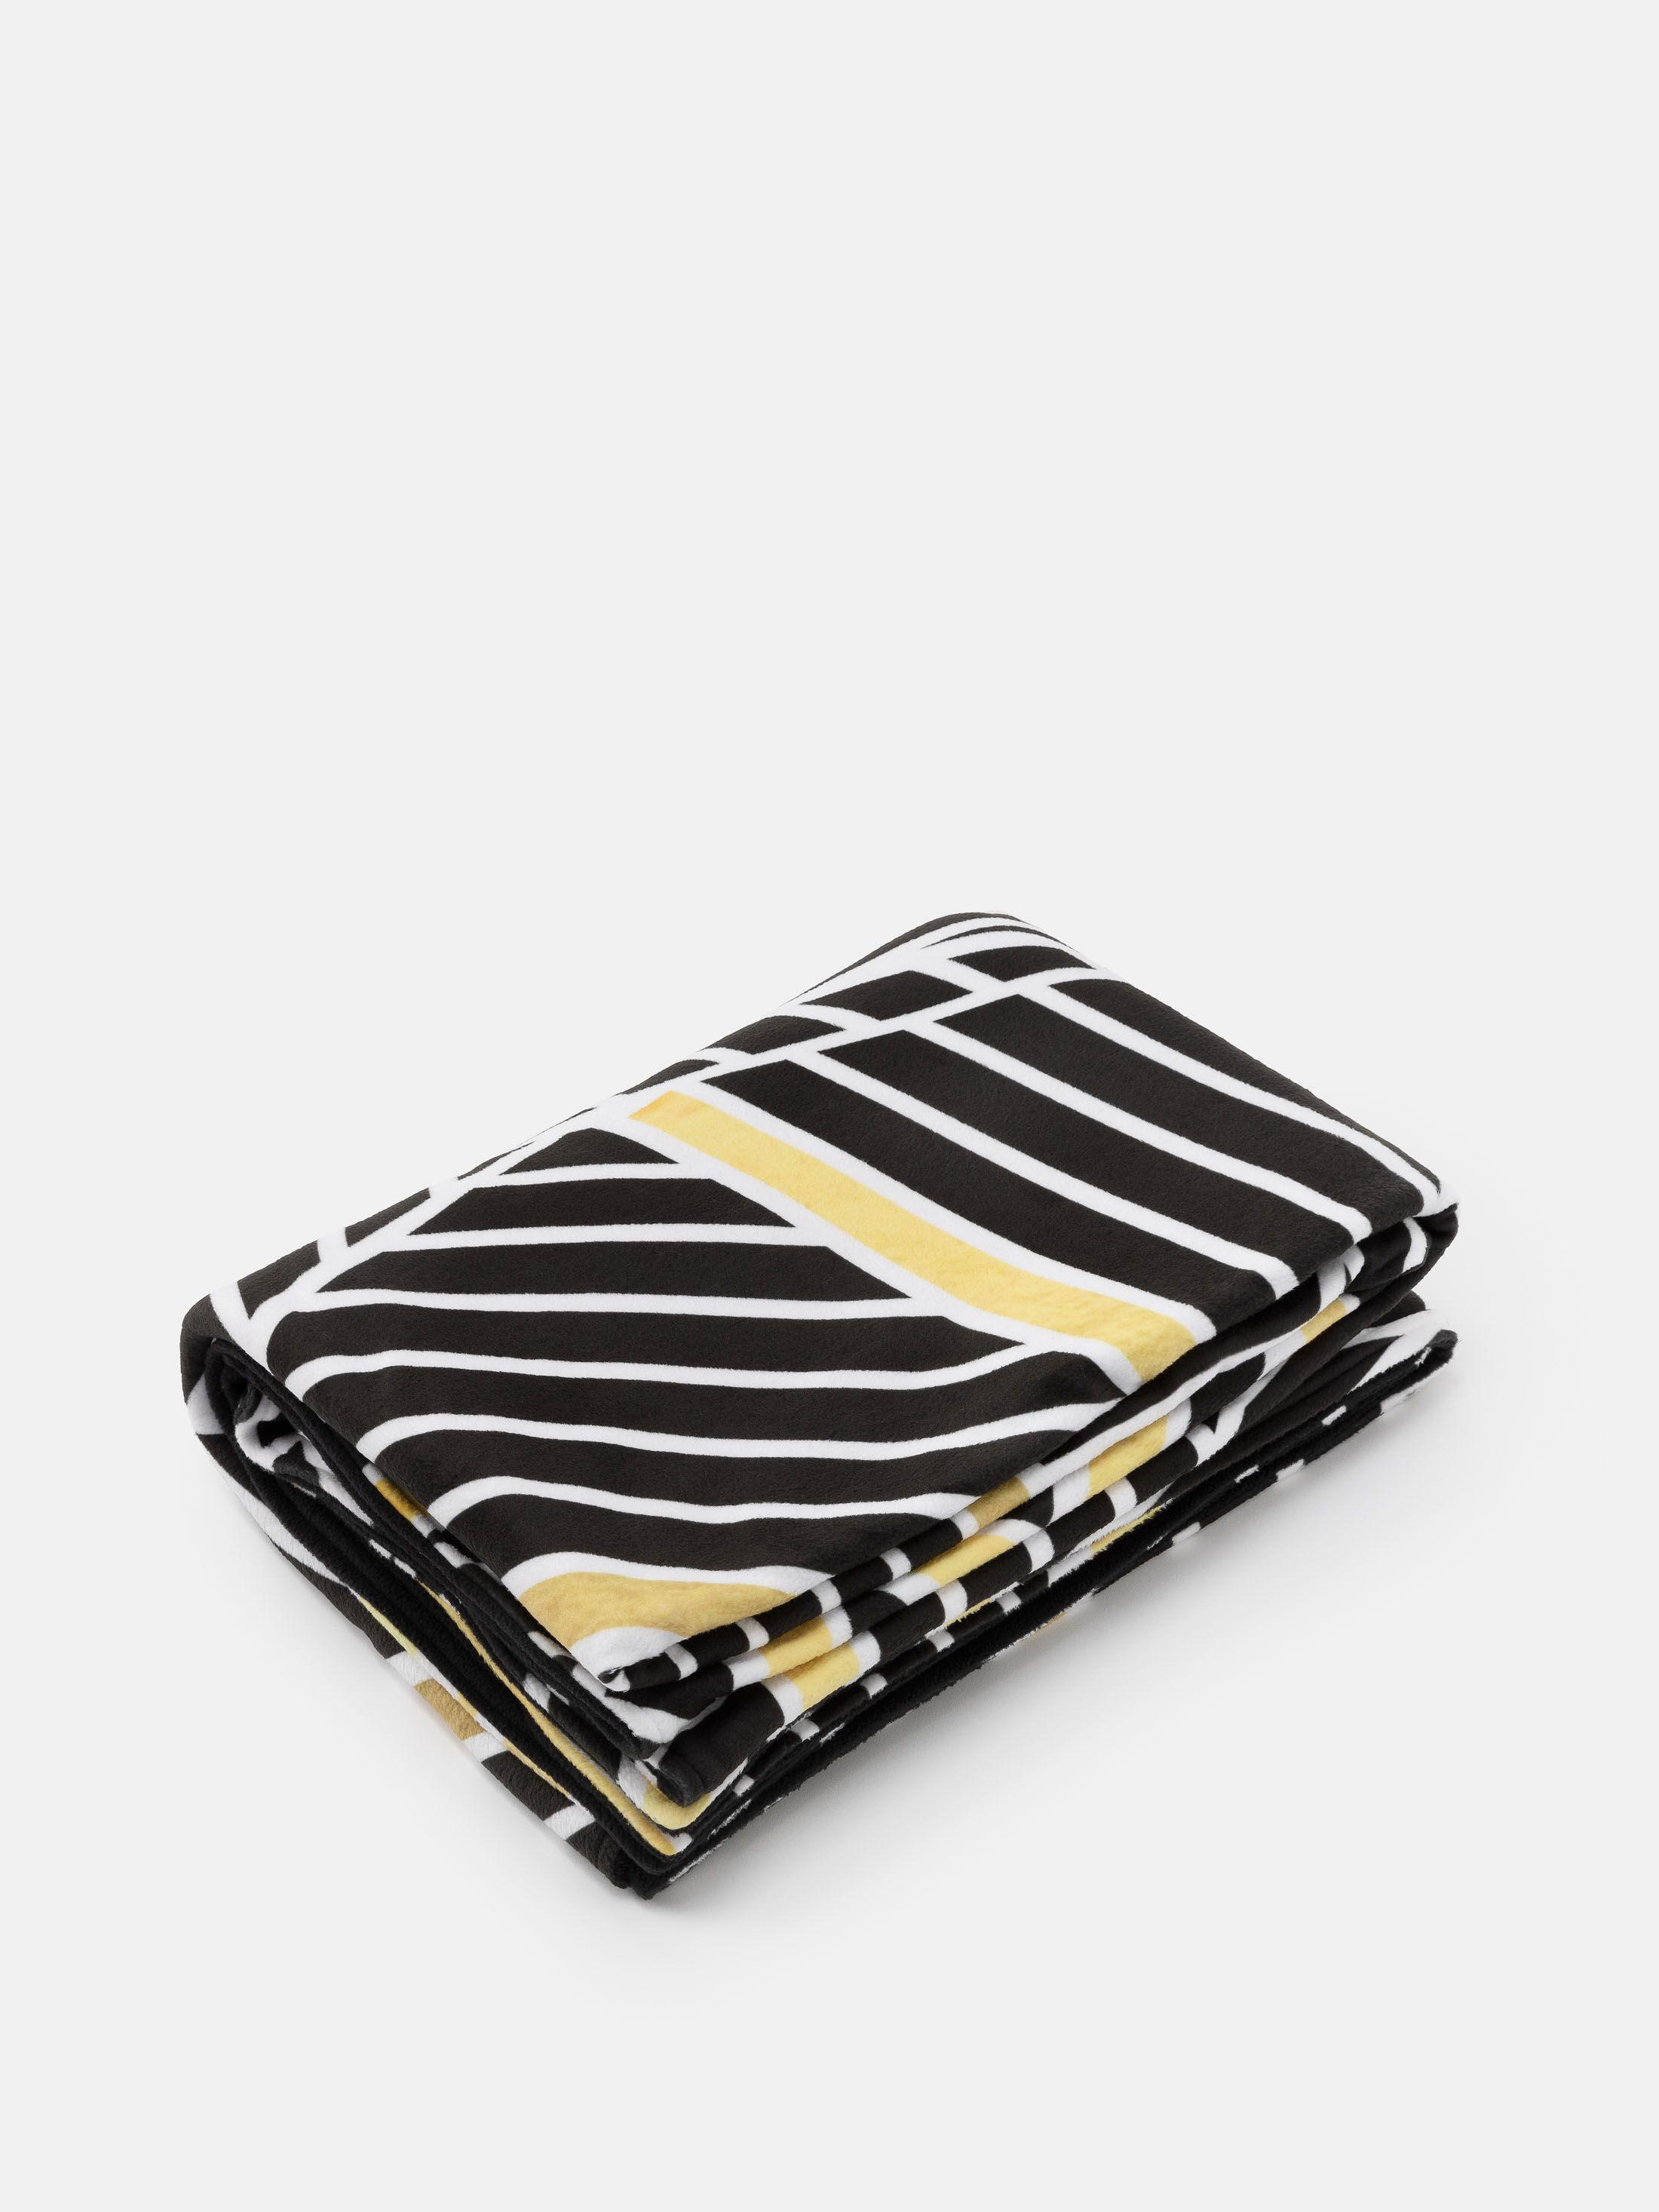 blankets range